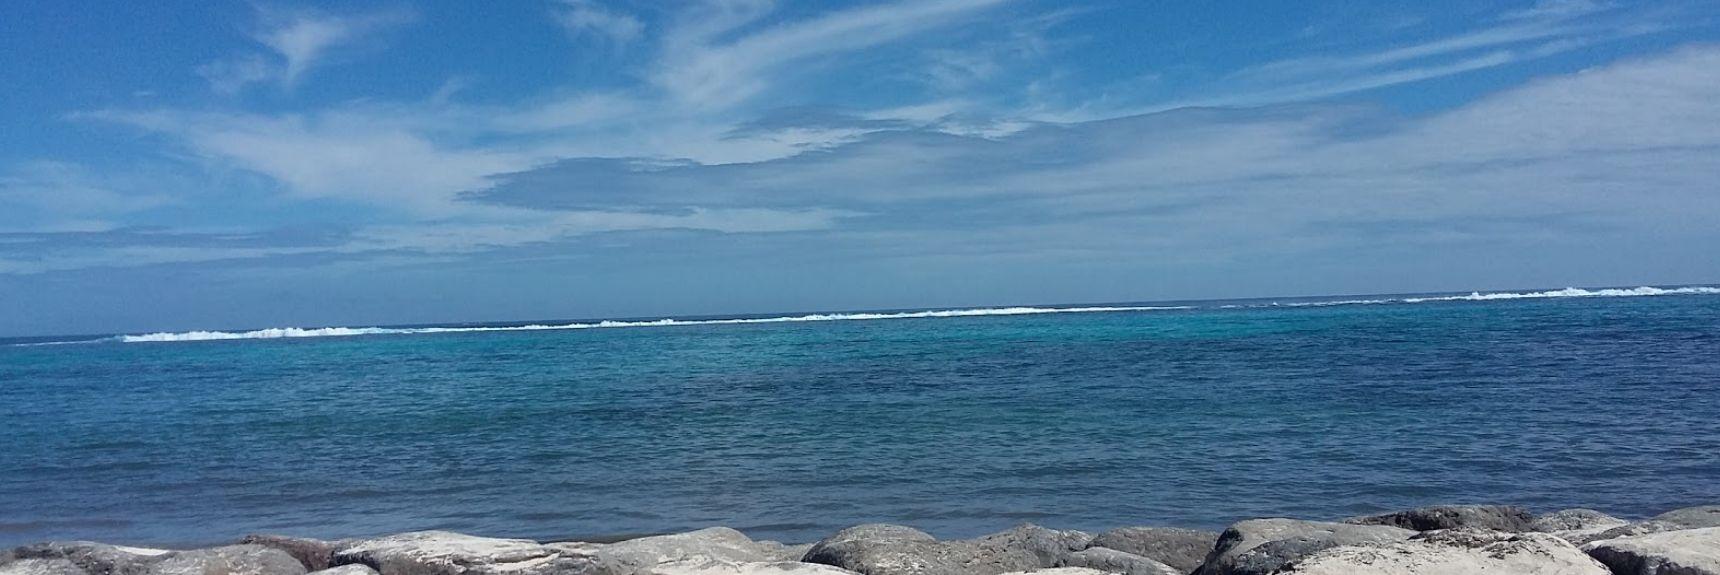 Māhina, French Polynesia